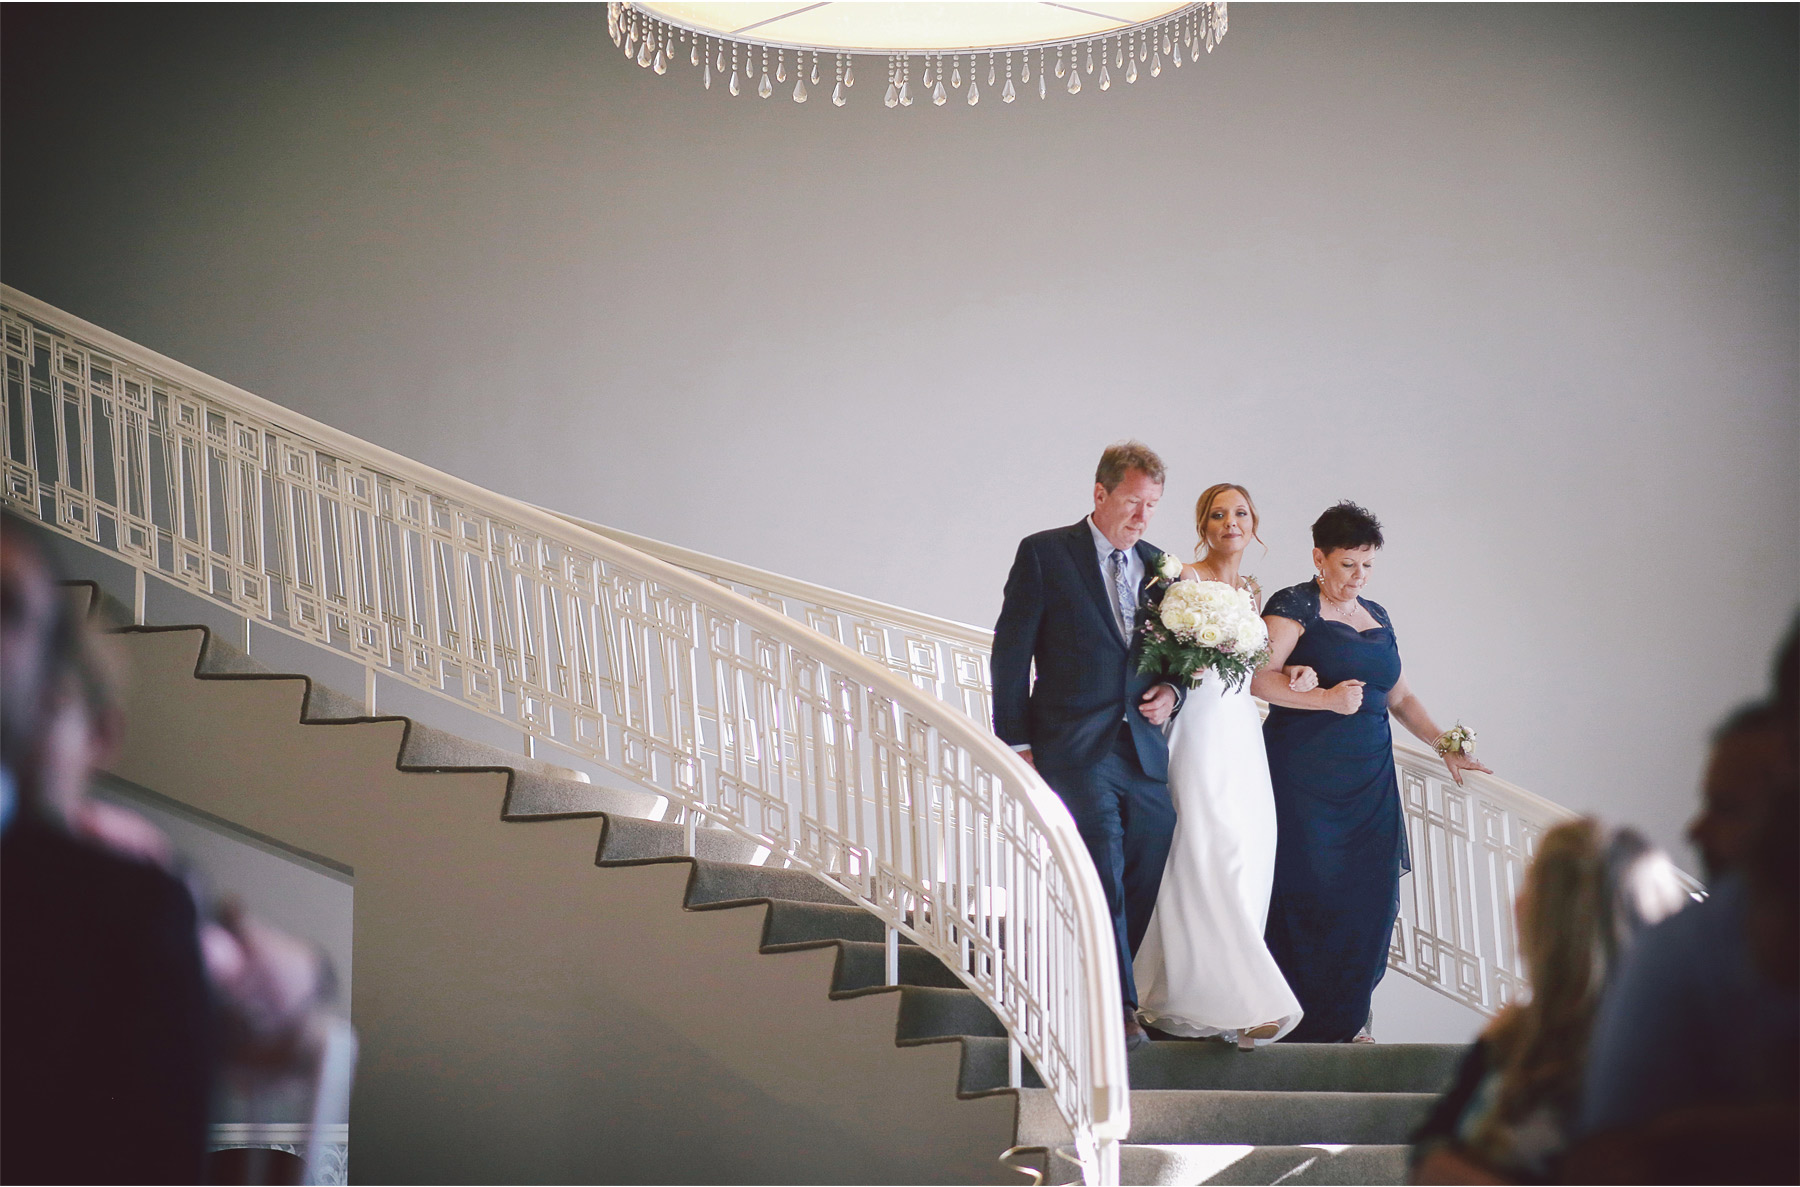 12-Minneapolis-Minnesota-Wedding-Andrew-Vick-Photography-Calhoun-Beach-Club-Ceremony-Staircase-Samantha-and-Ryan.jpg